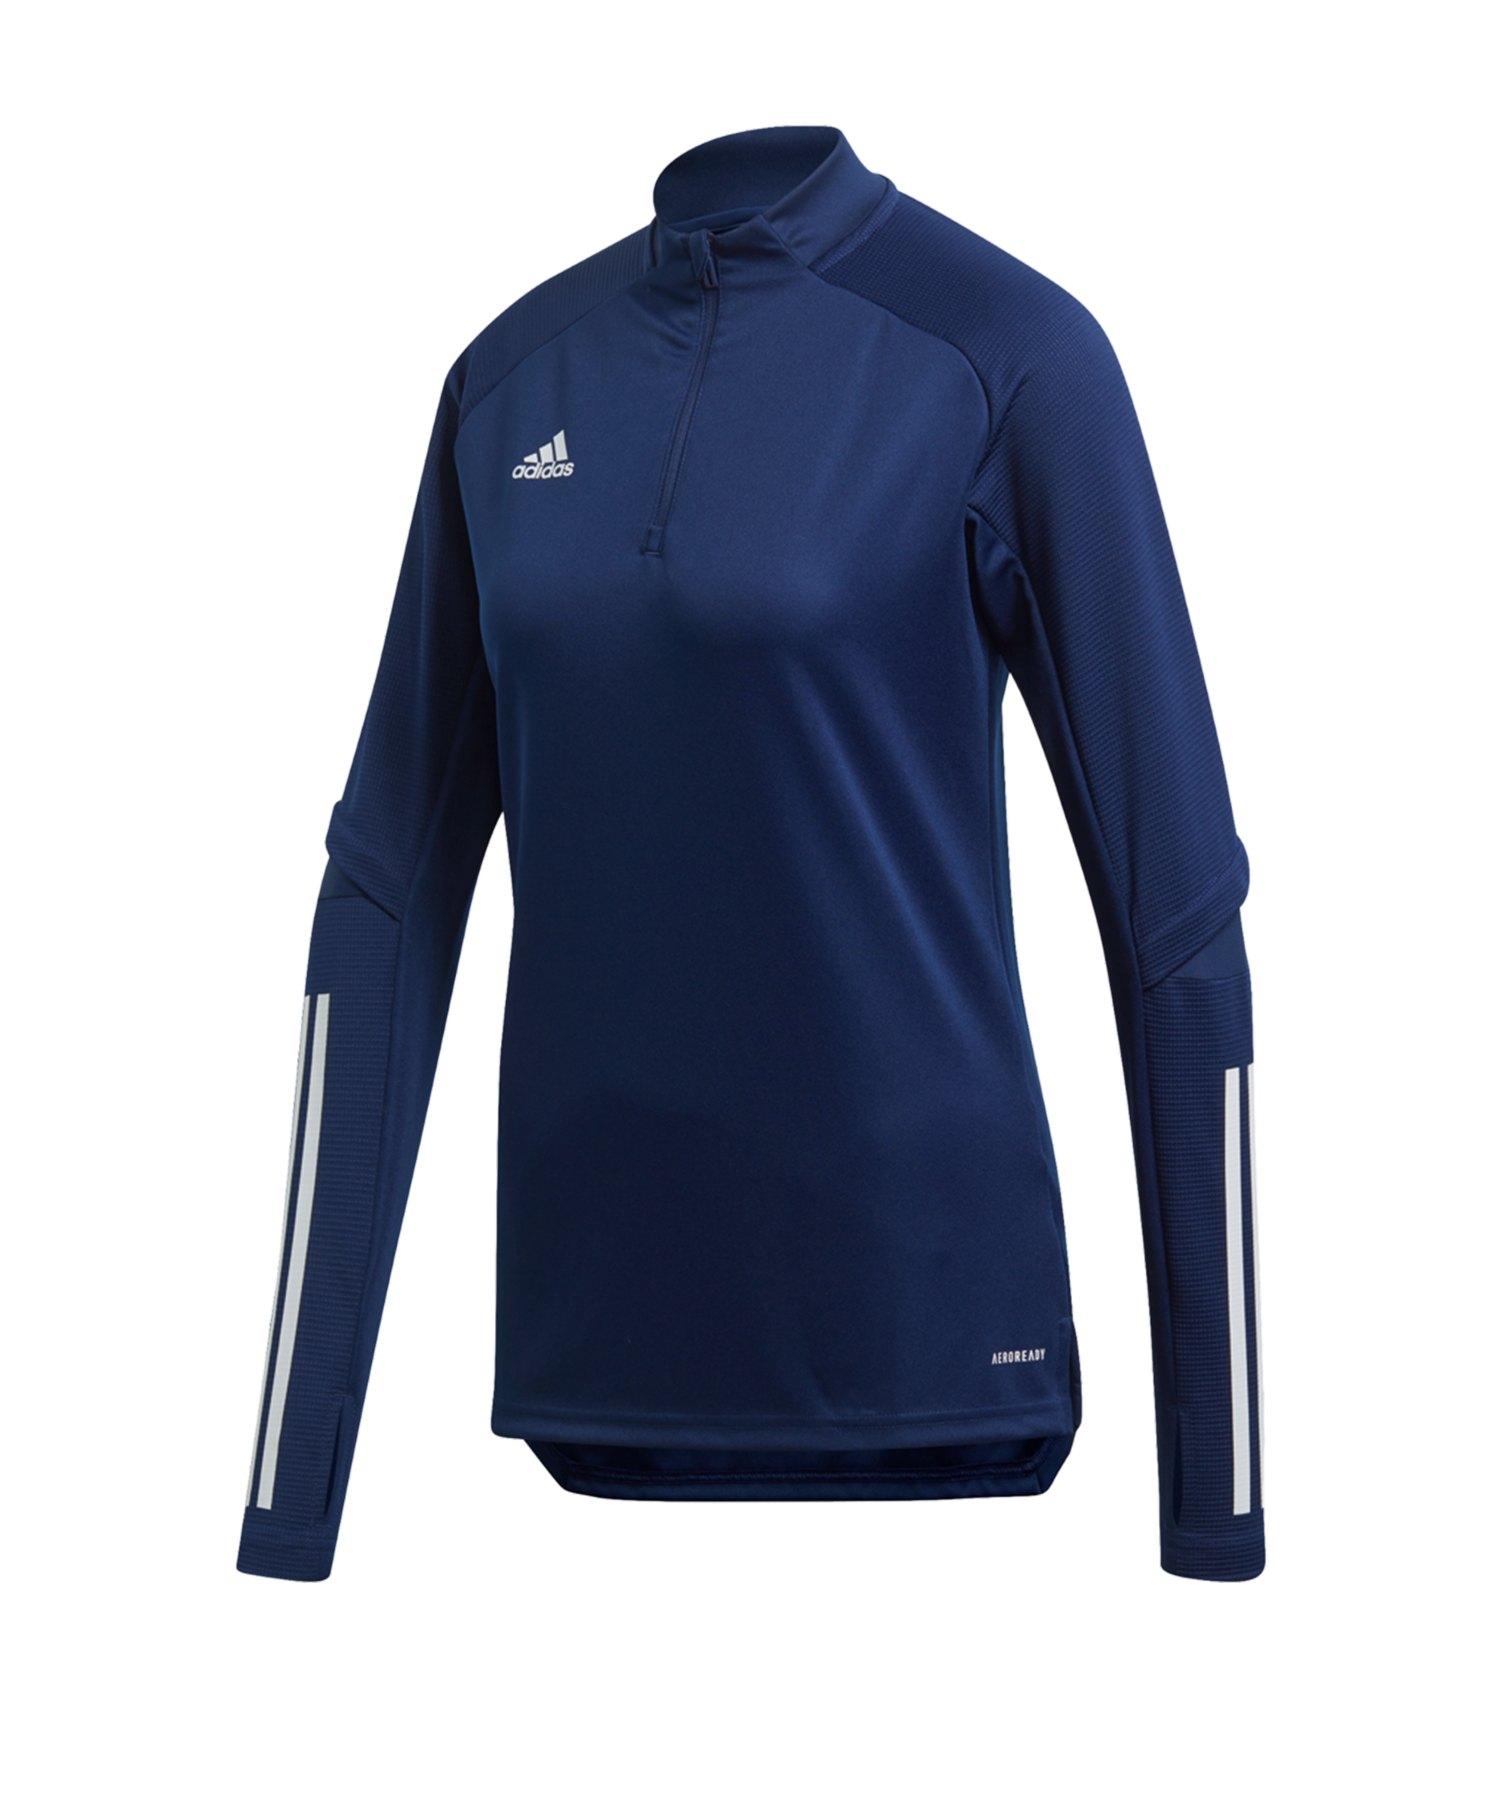 adidas Condivo 20 Trainingshose Damen Blau Weiss